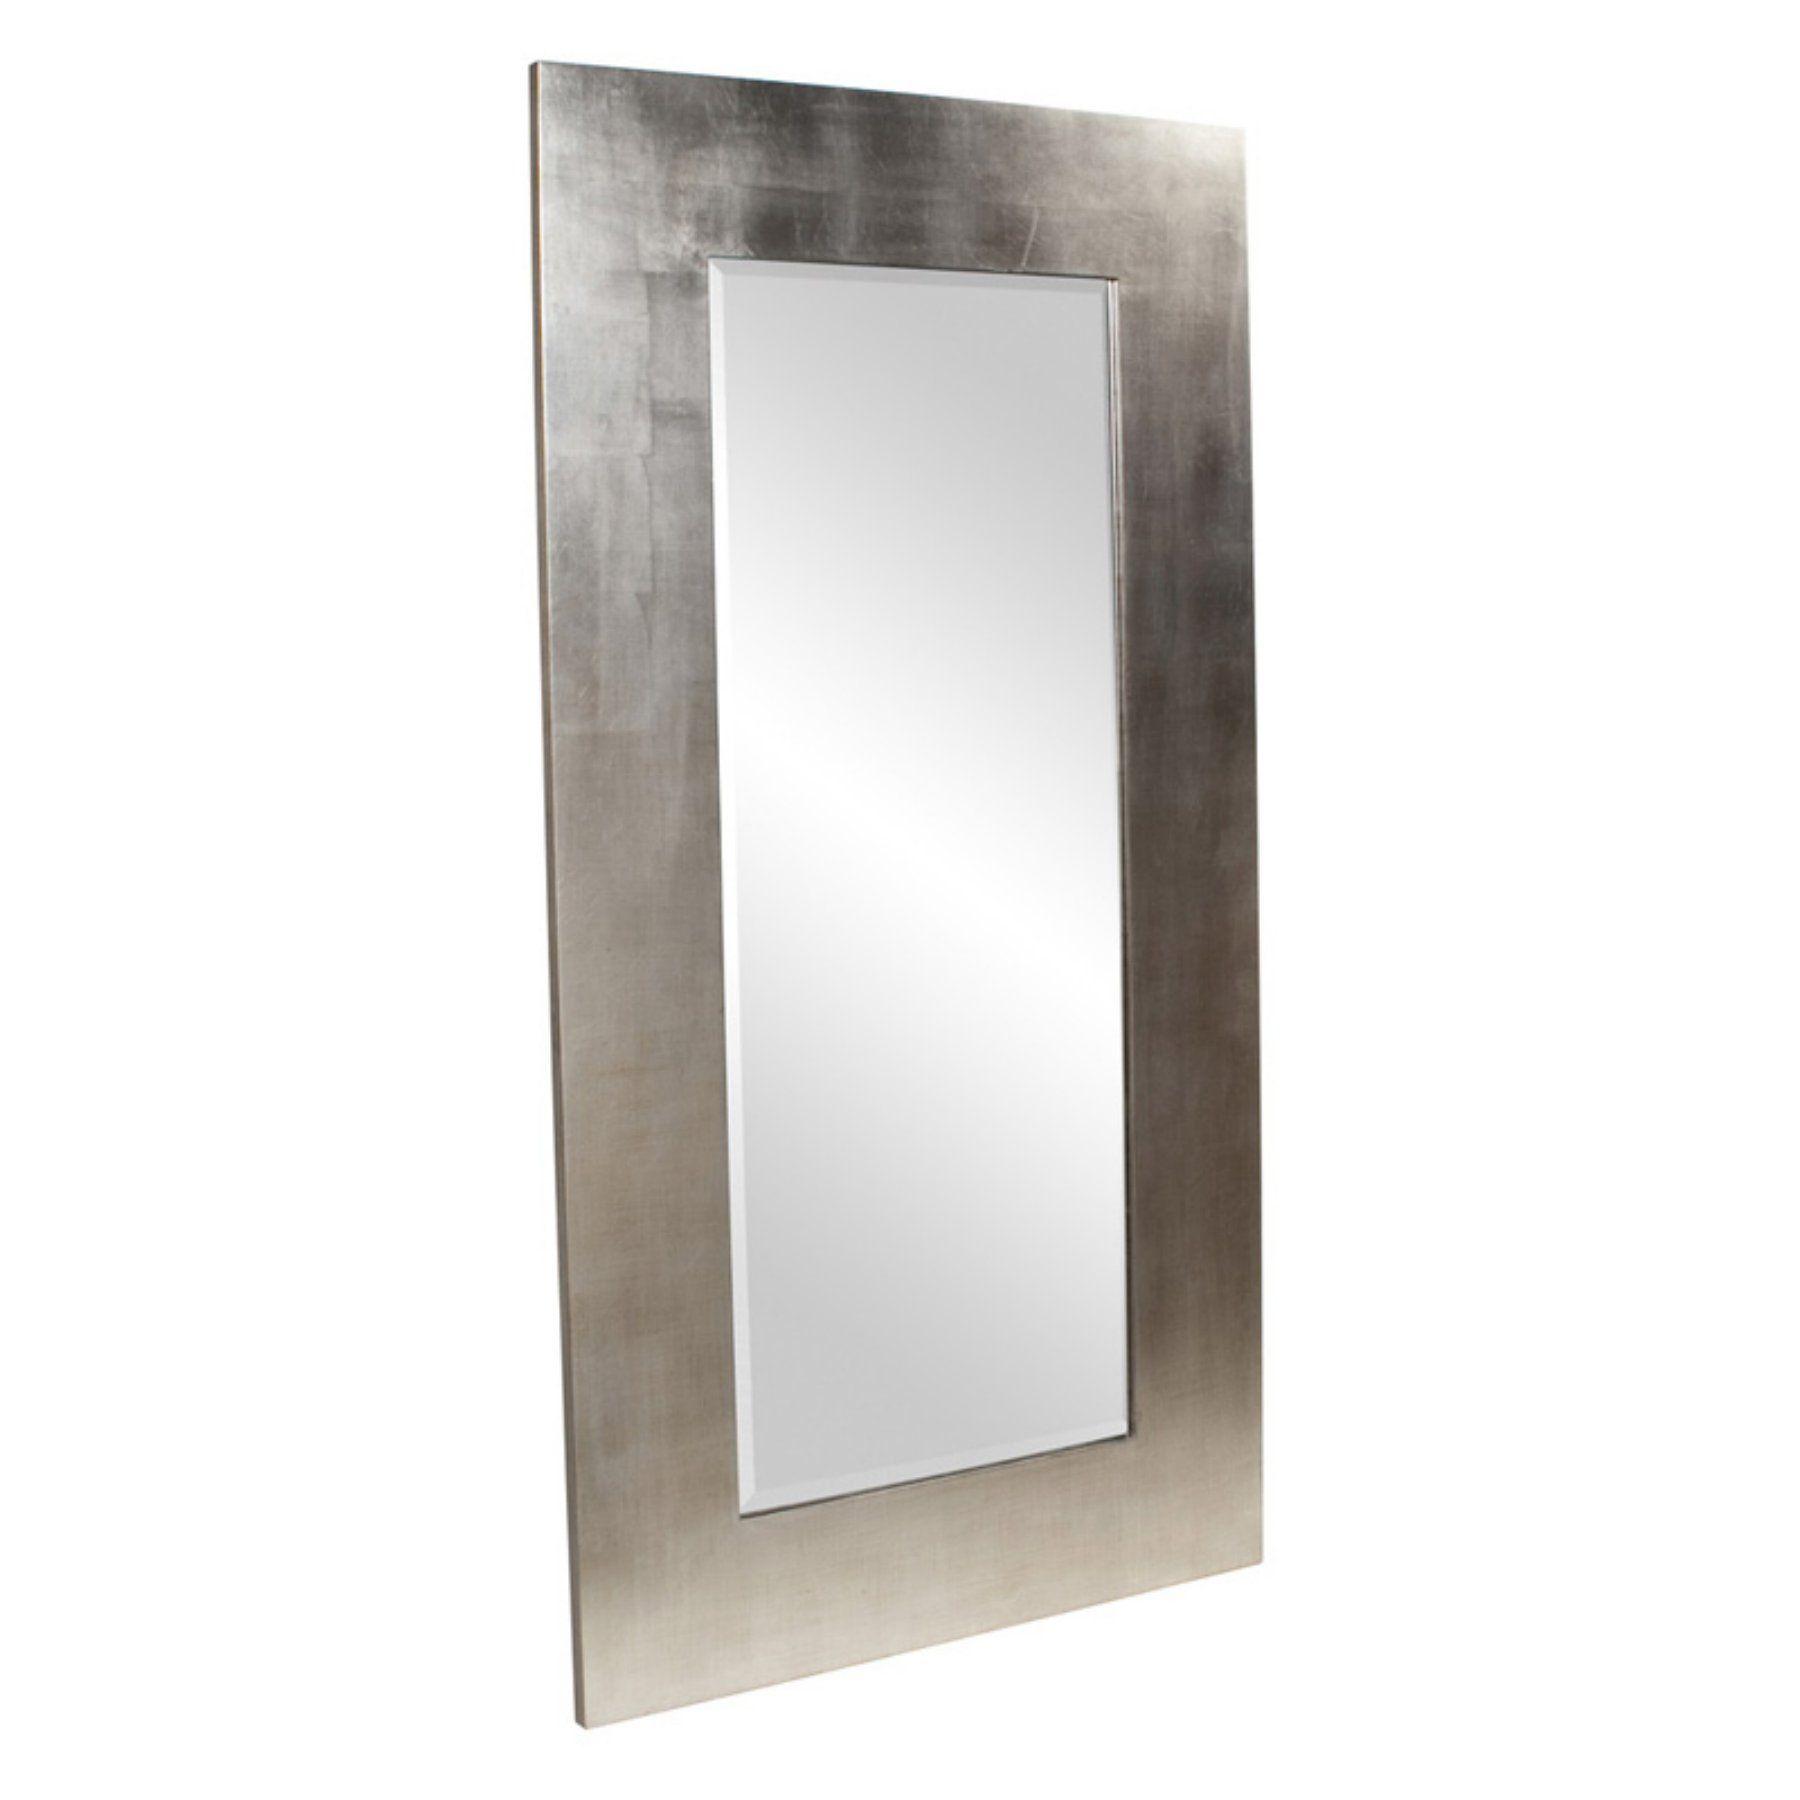 Elizabeth Austin Sonic Silver Leaning Floor Mirror 38w X 72h In